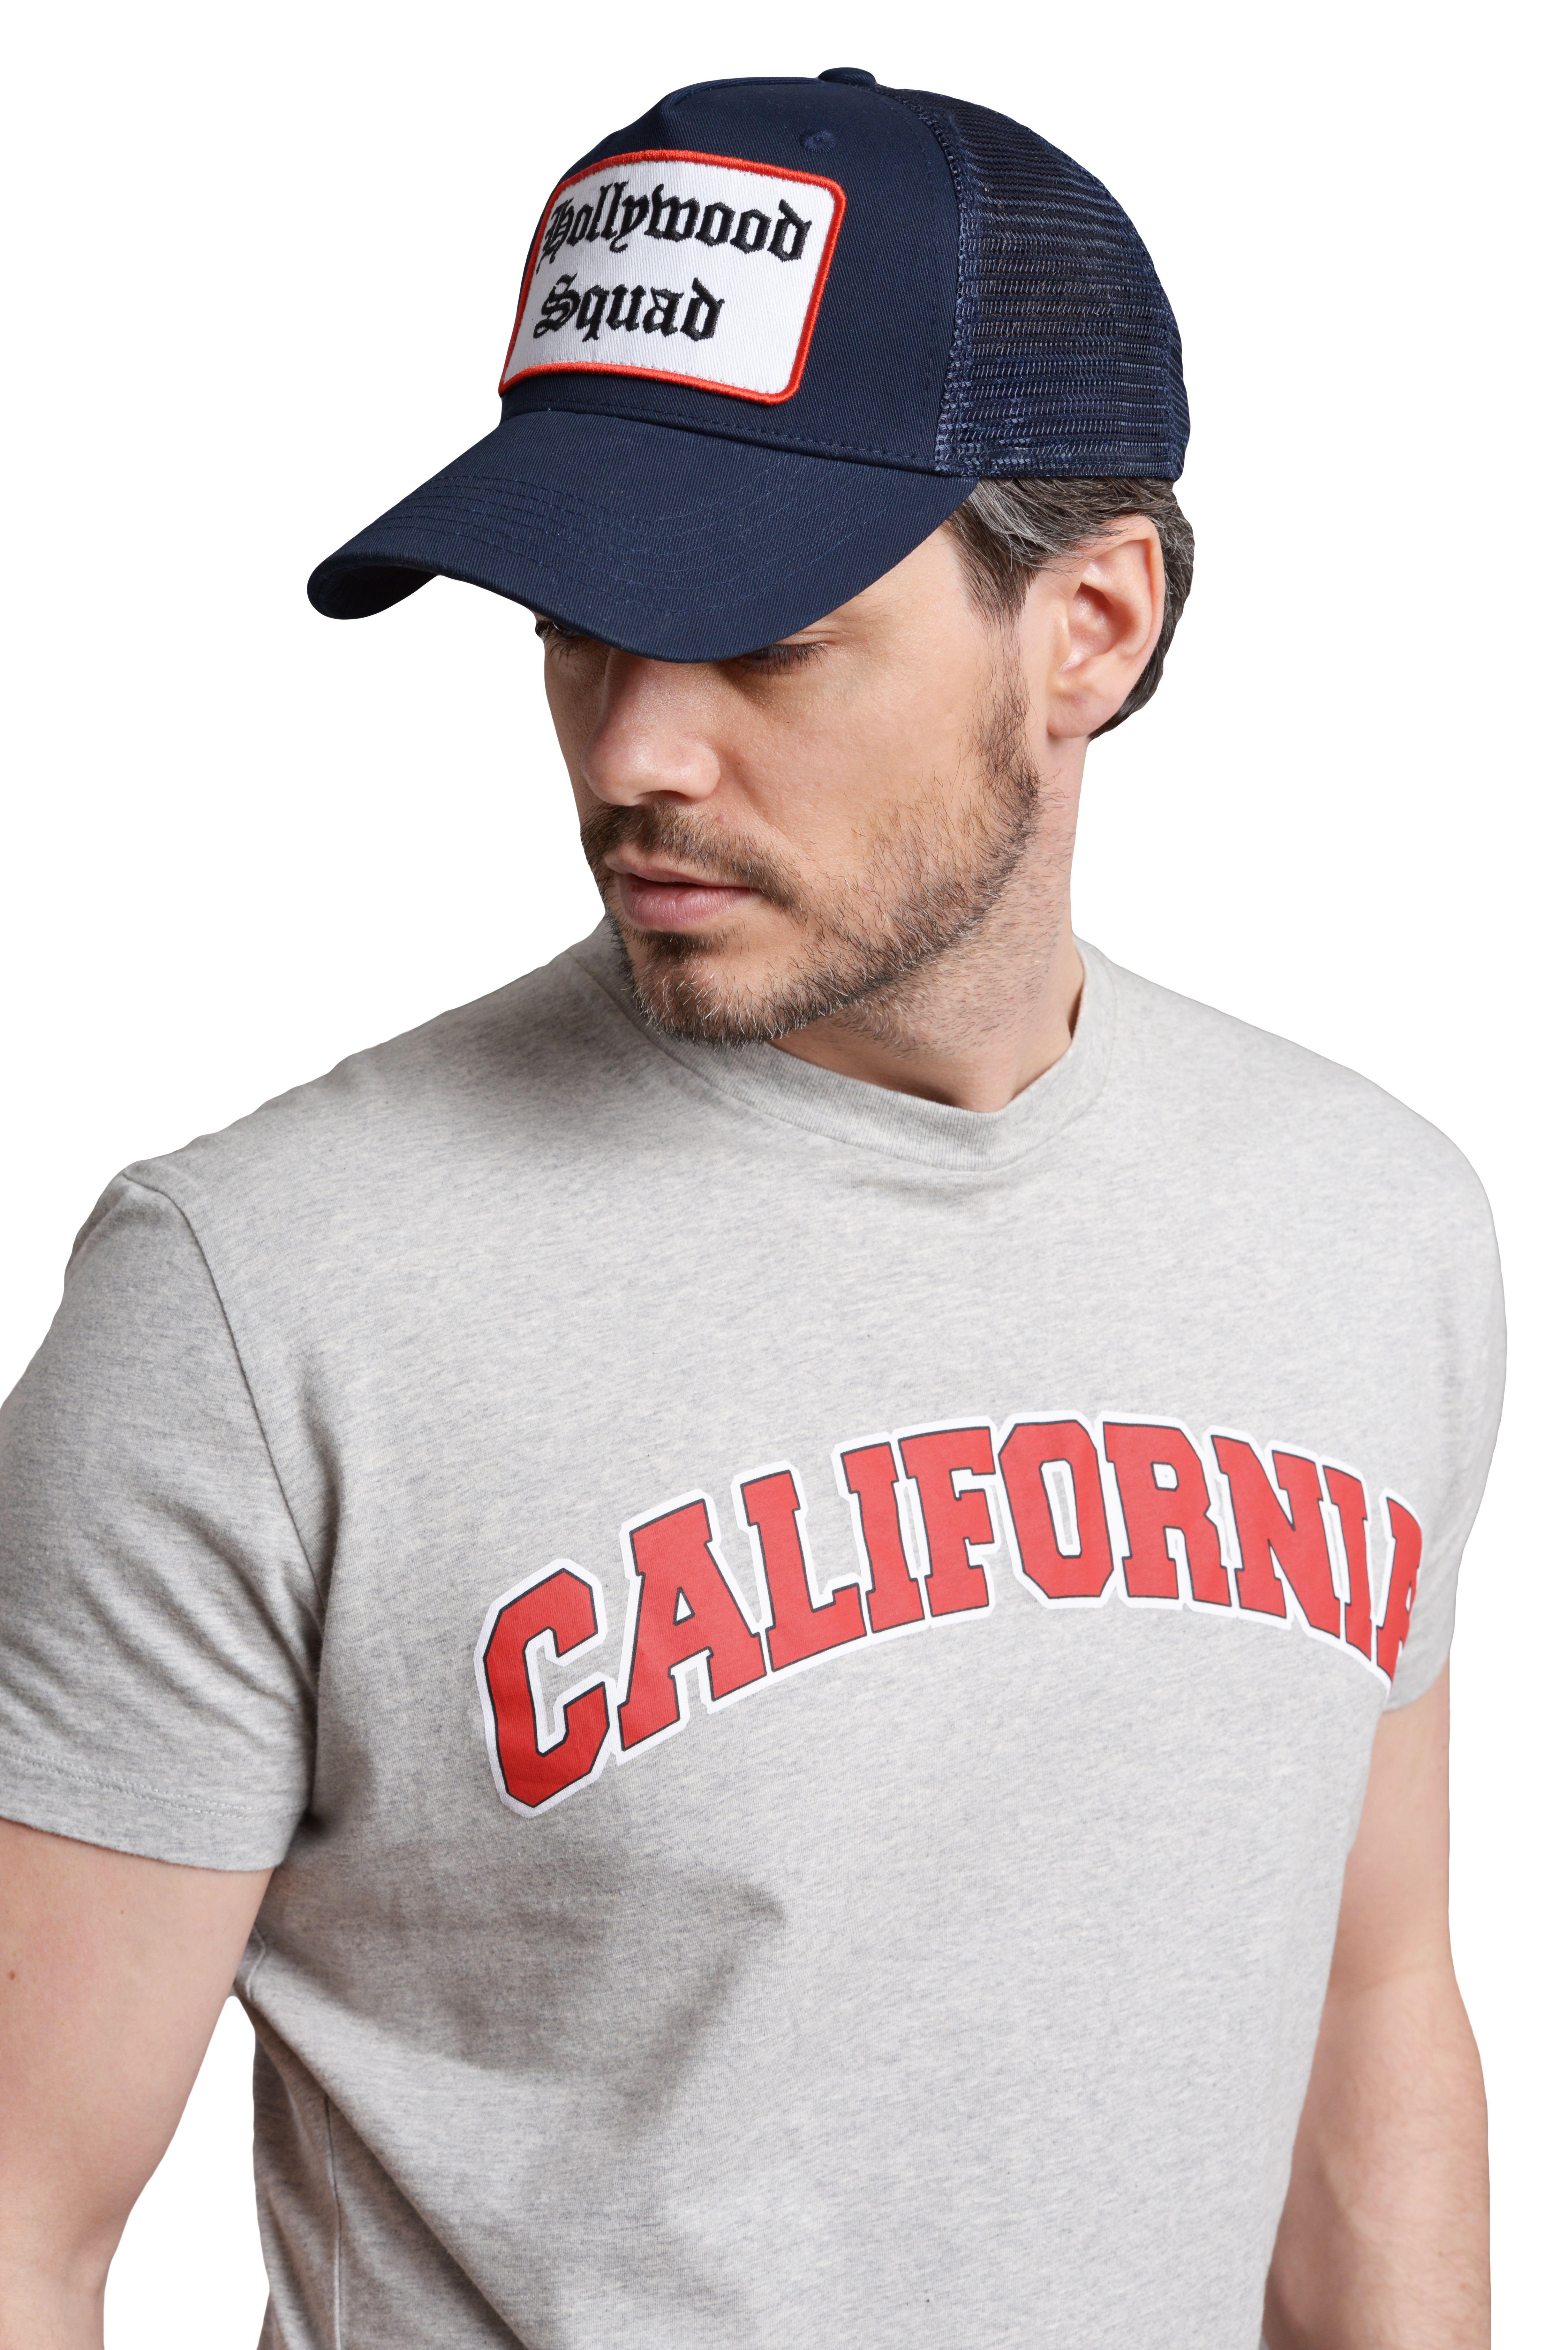 Truckercap Los Angeles Hat camouflage Chiccheria Brand Trucker Cap